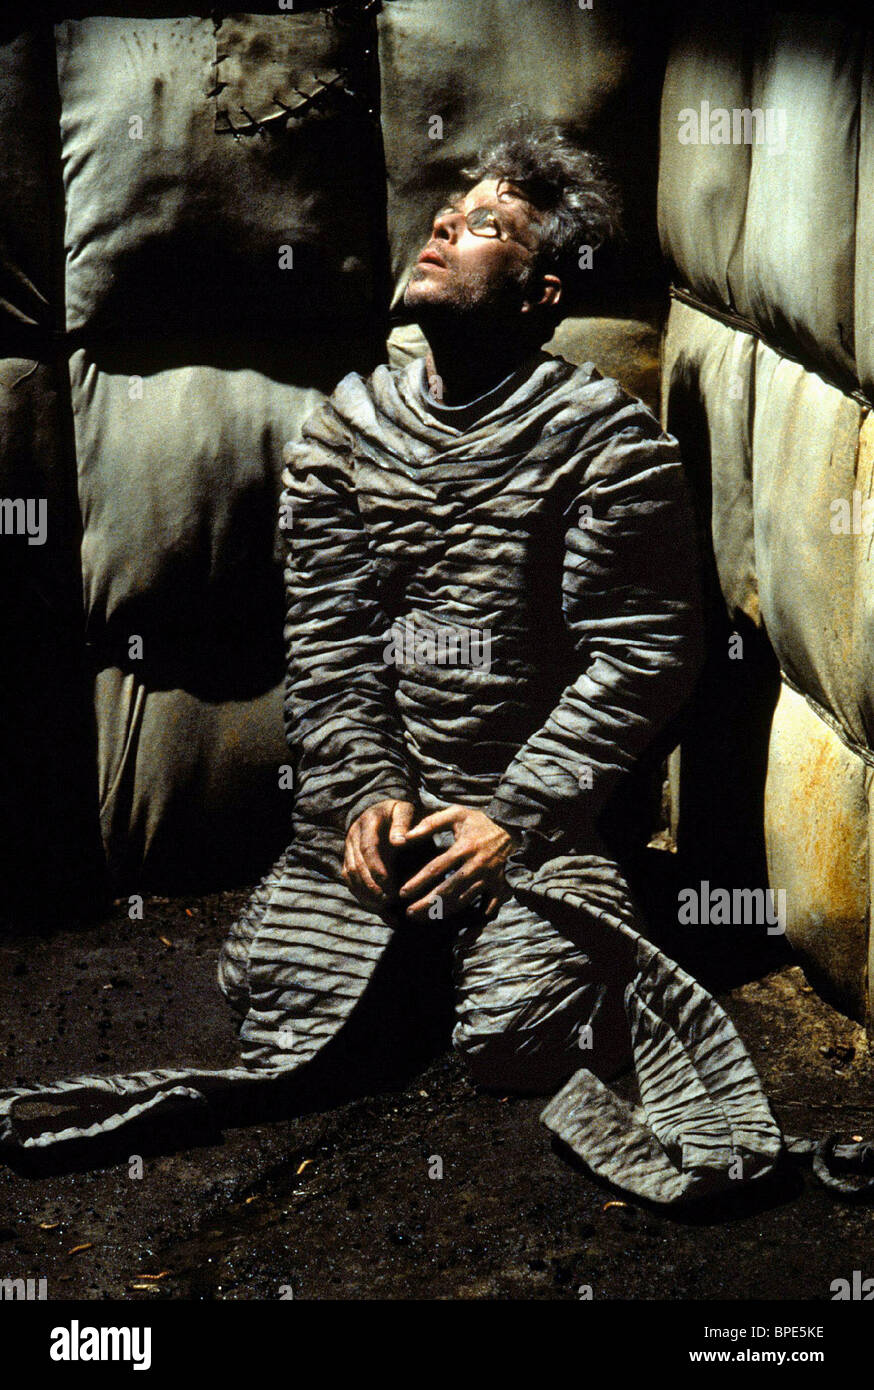 TOM WAITS BRAM STOKER'S DRACULA (1992) - Stock Image